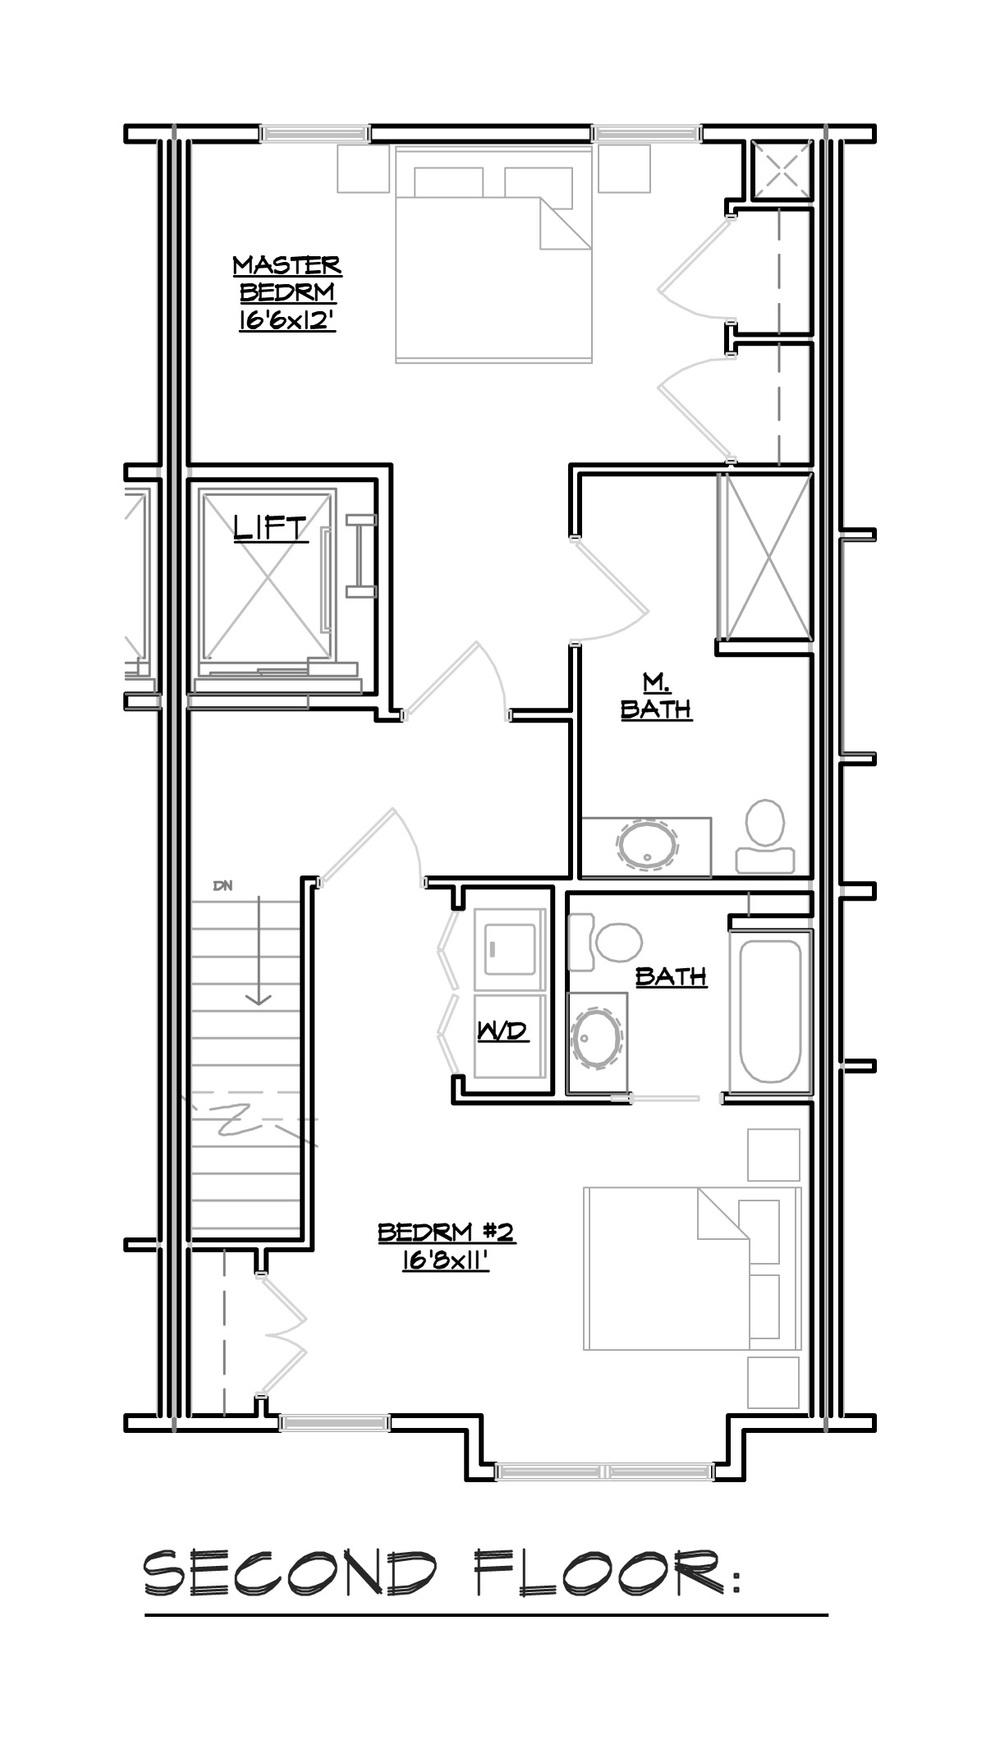 flooring handicap accessible bathroom floor plans and specs floor plans laurel hill village handicap accessible bathroom floor plans